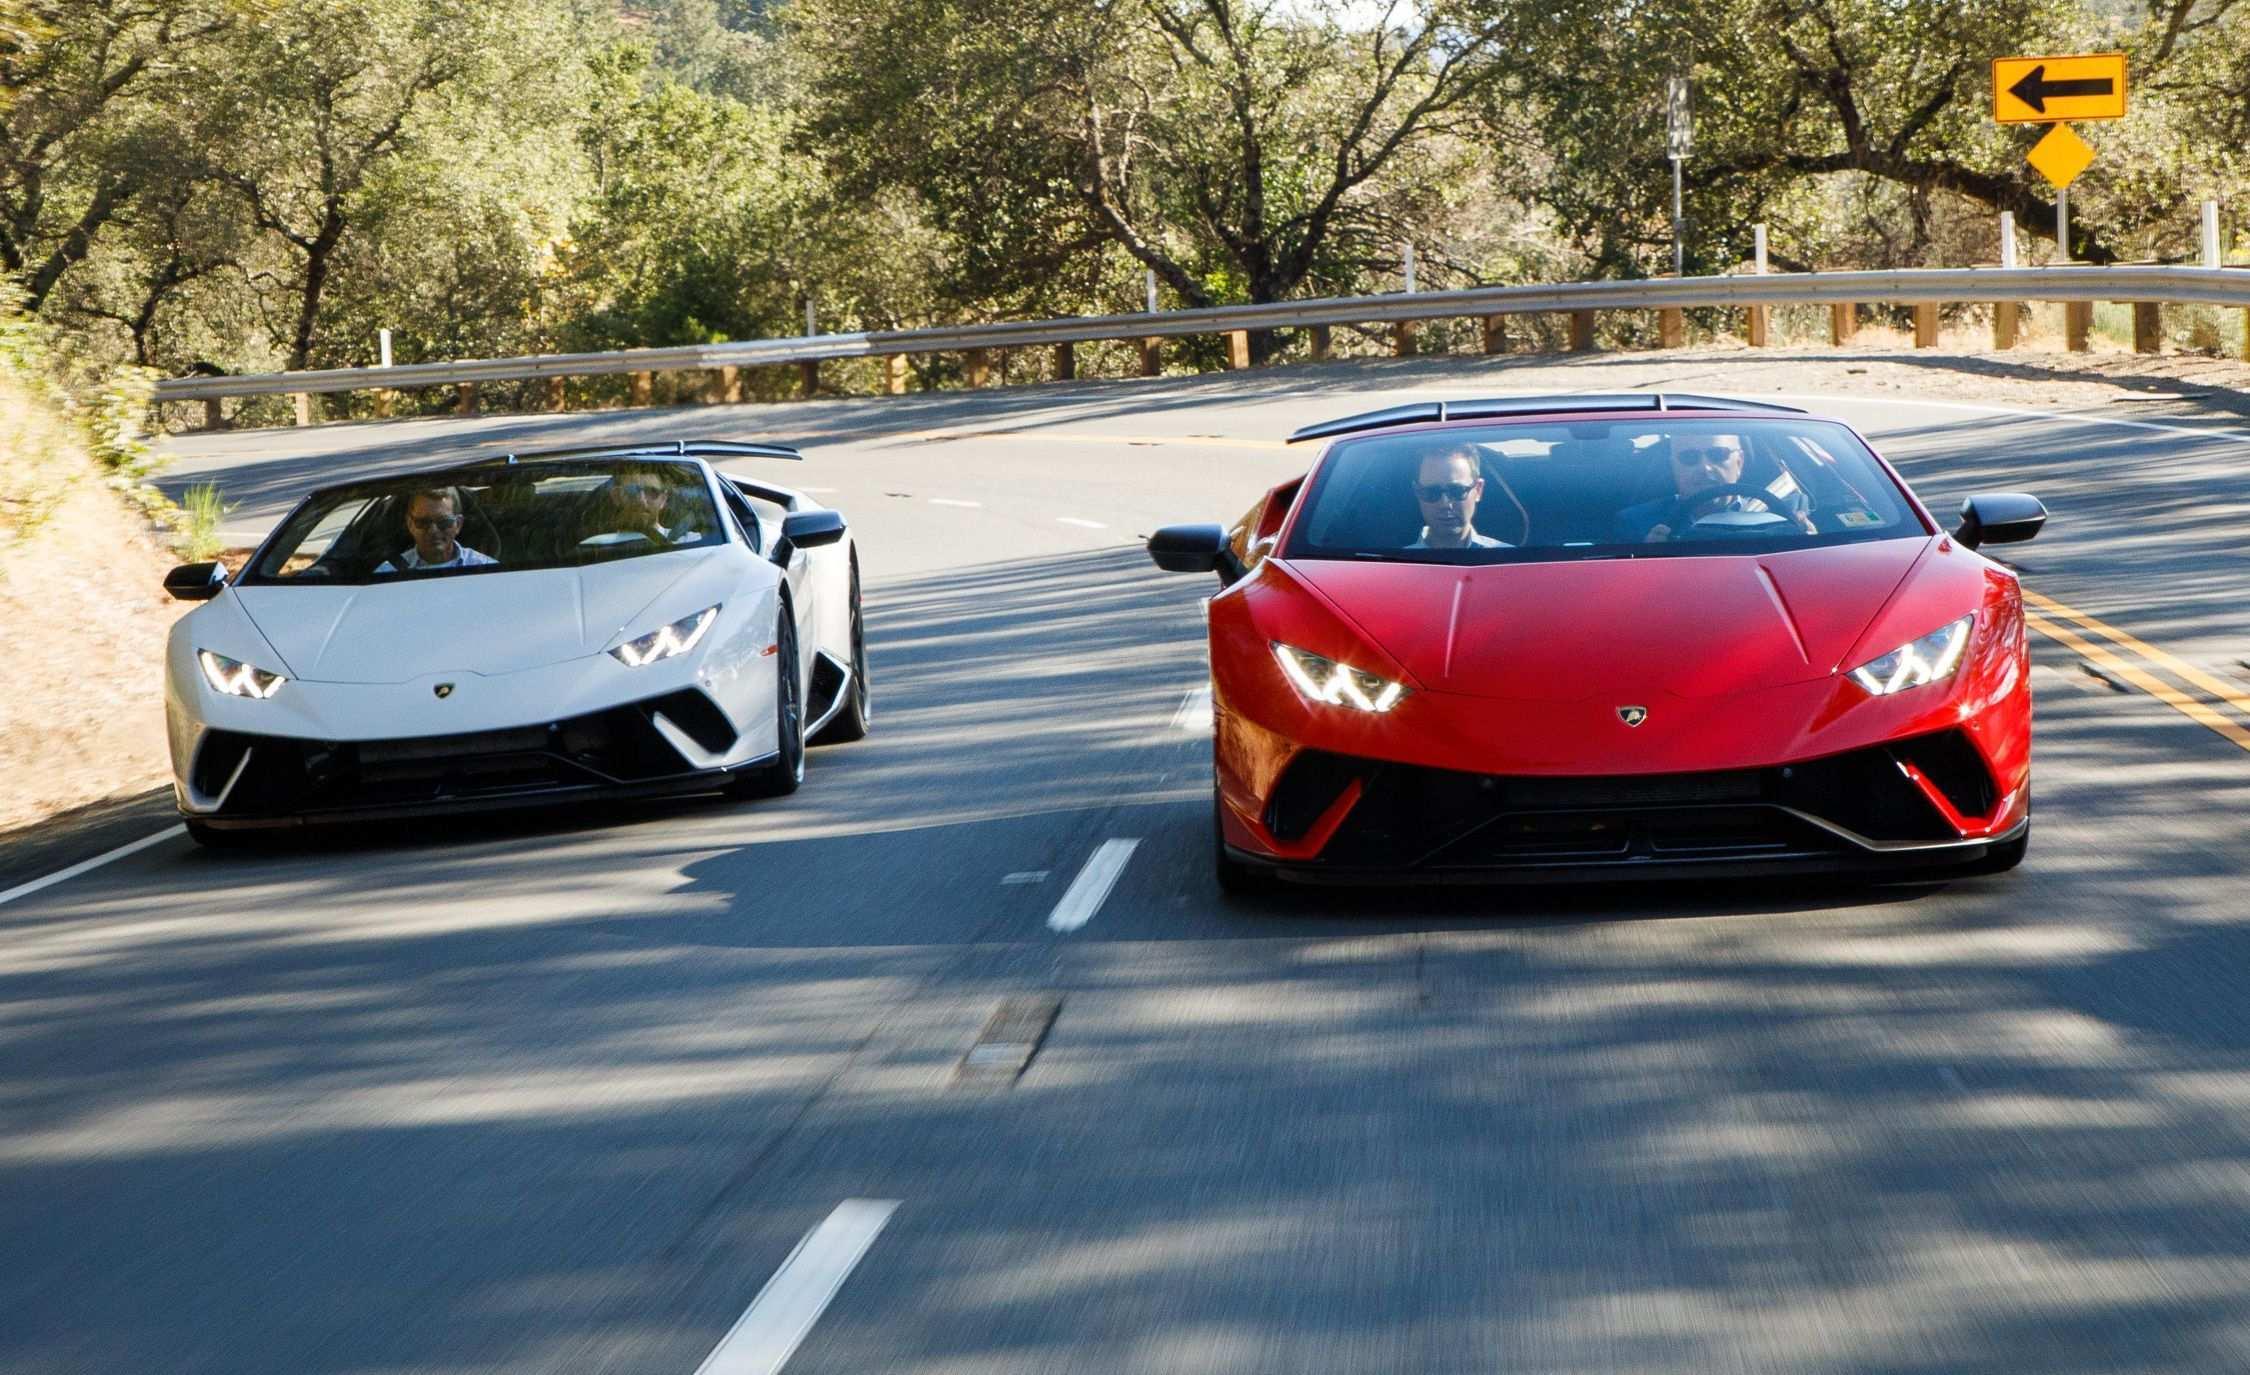 83 Best Review 2019 Lamborghini Horsepower Release Date for 2019 Lamborghini Horsepower